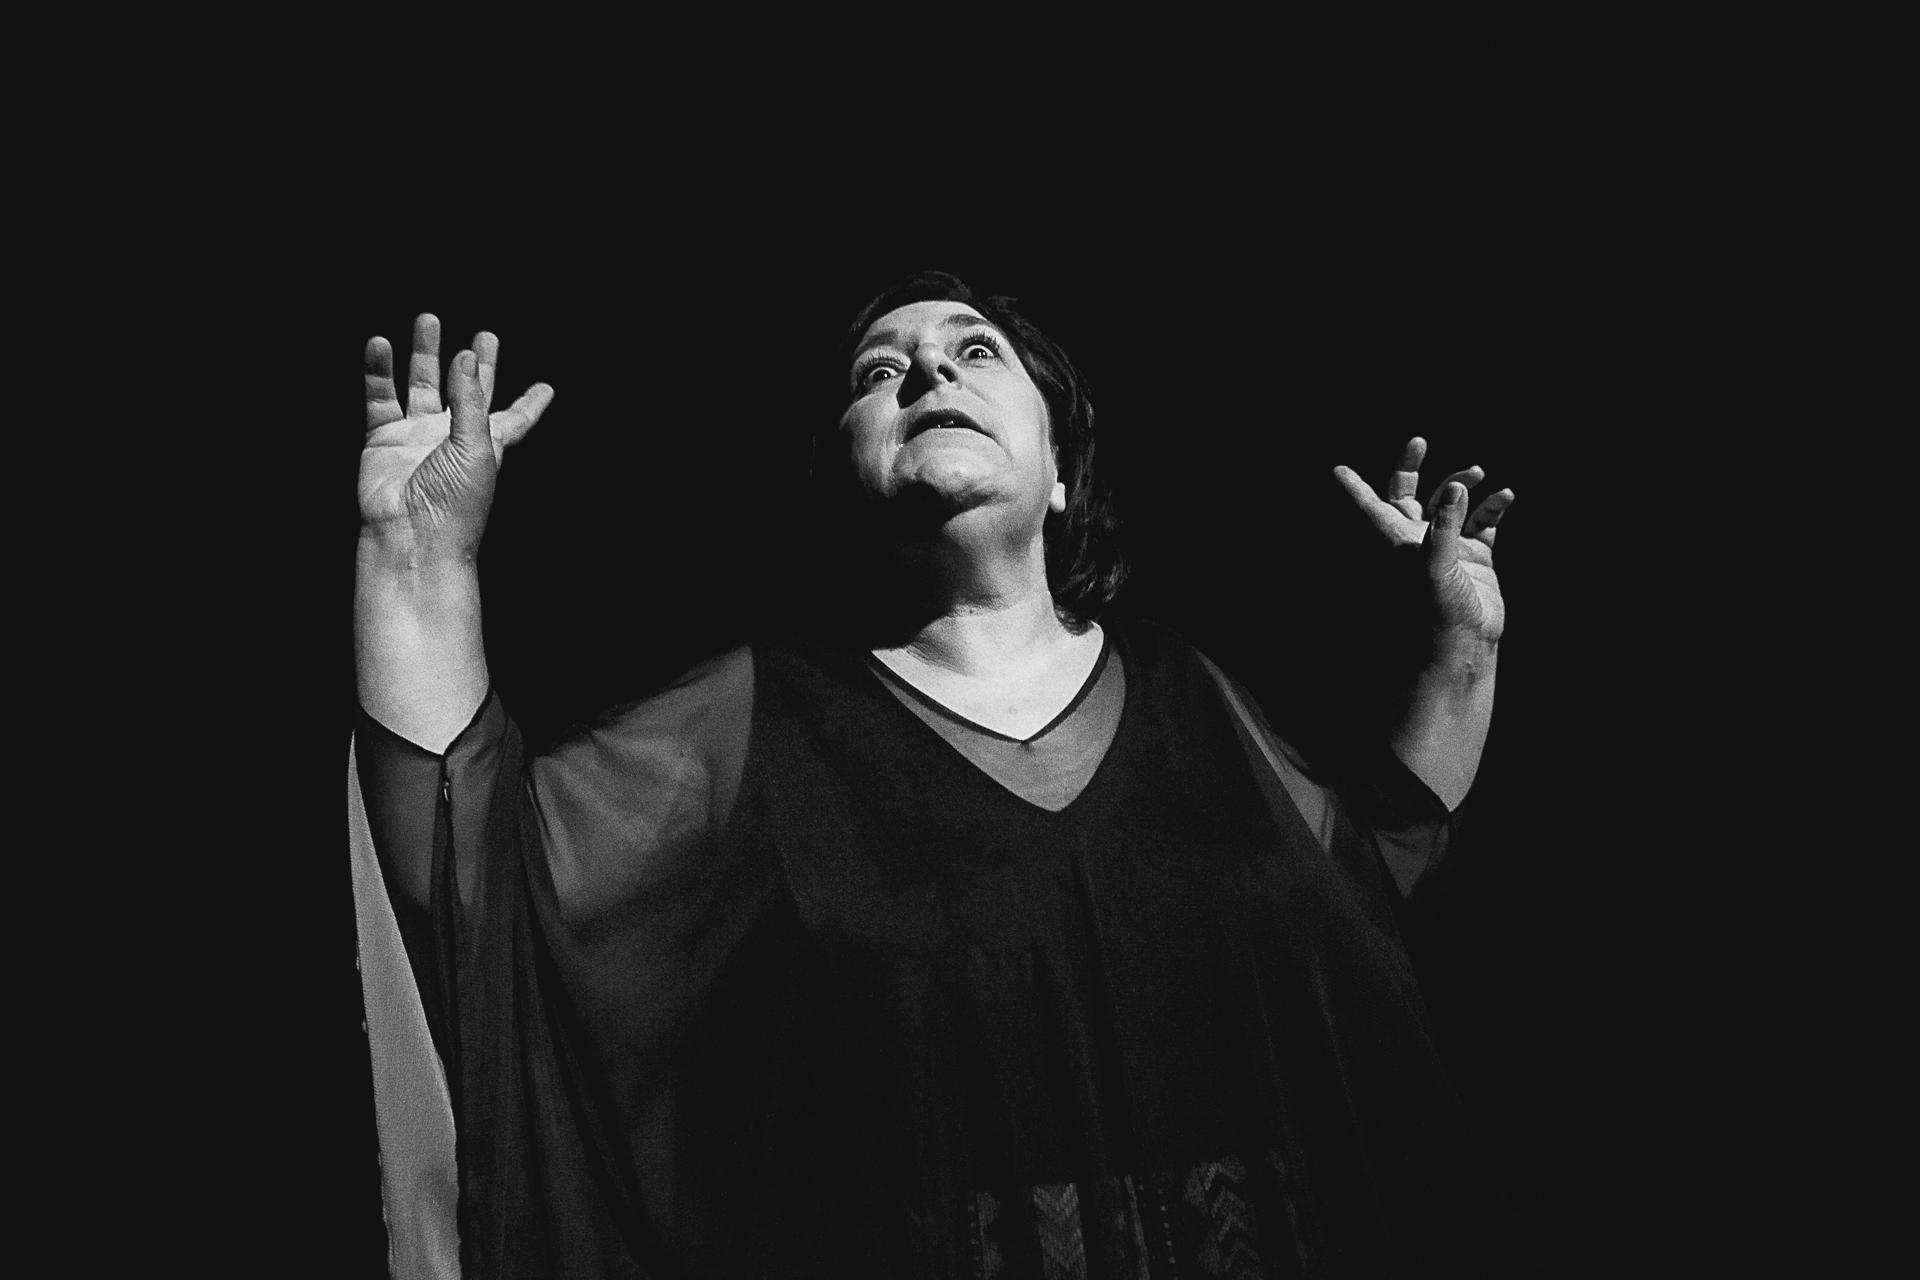 Doroteia Serafim outras historias assim Photography Fotografia On Stage Theatre Teatro bonjourmolotov Andre Gigante 09